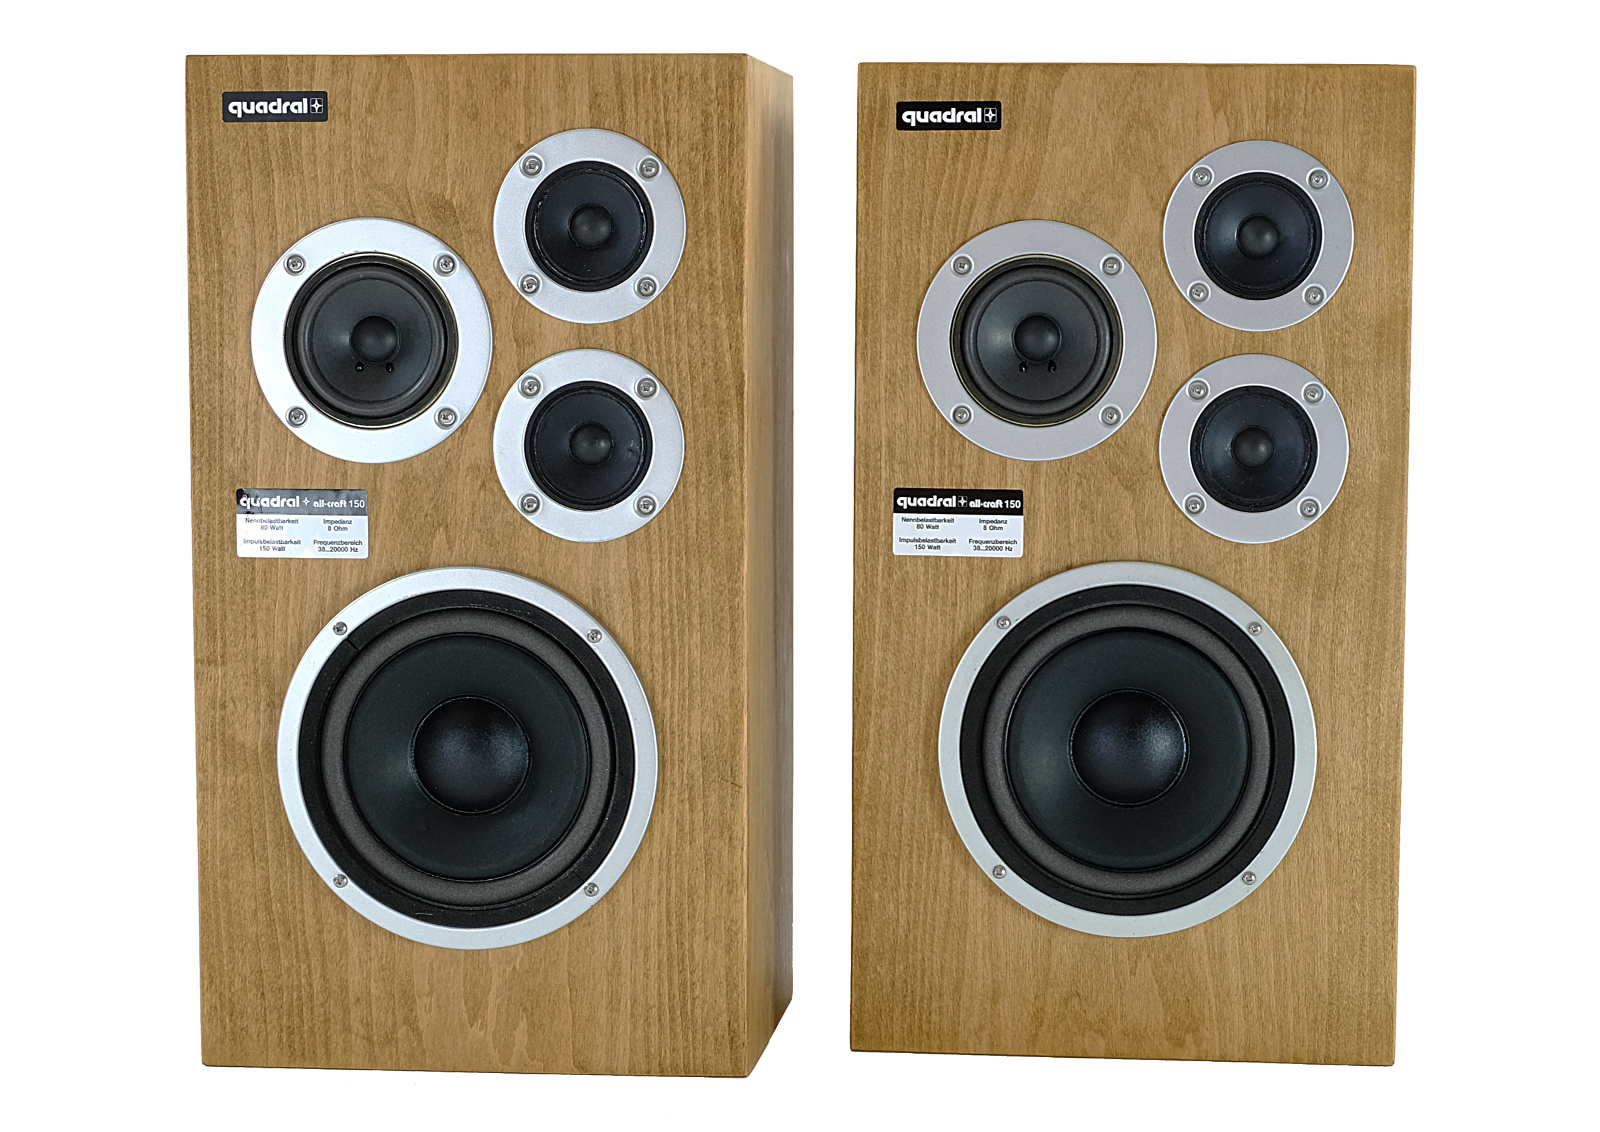 Vintage Quadral All Craft 150 Speakers